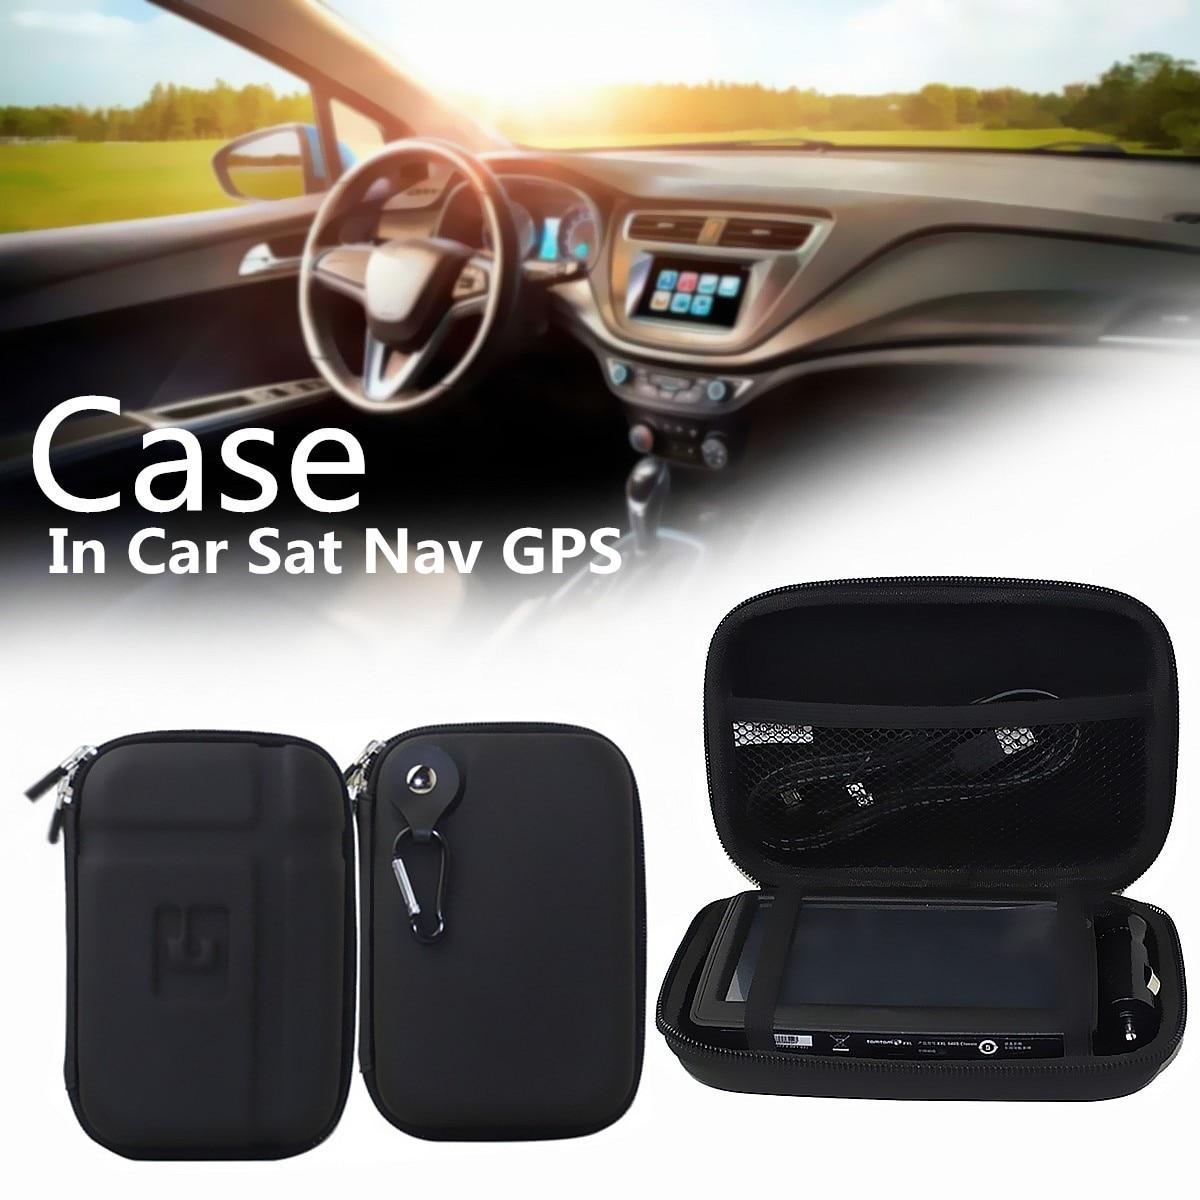 5 Inch Hard Shell EVA Carrying Sat Navigator GPS Storage Case Cover Carry Waterproof Bag for Tom/Tom GO 5100 5000 510 500